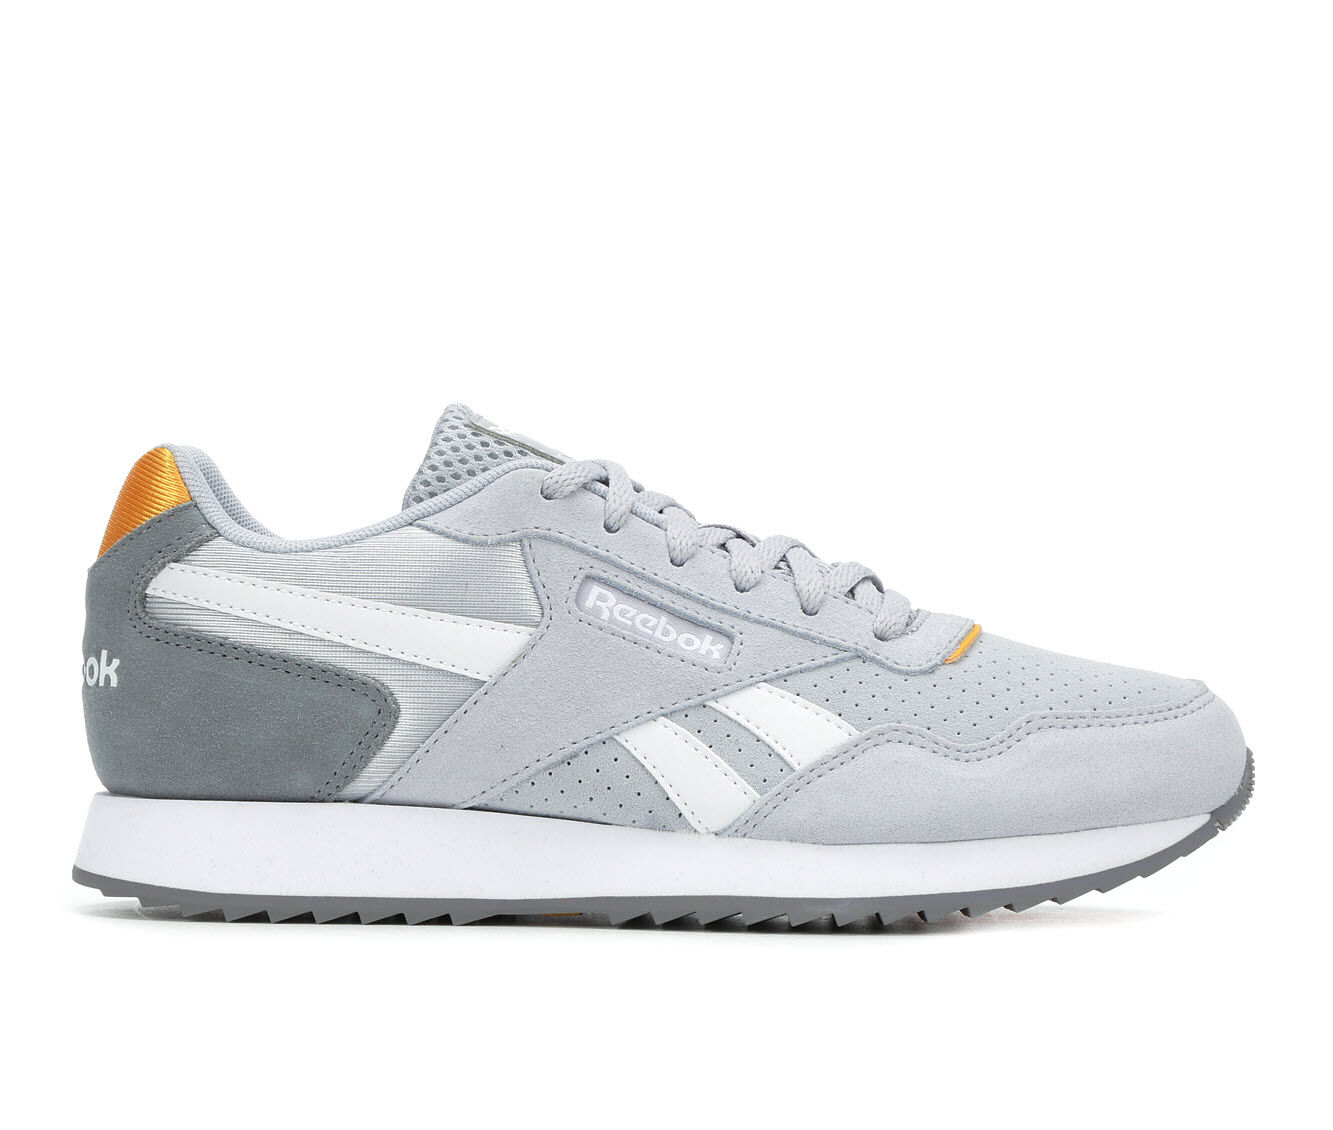 Reebok Shoes | Shoe Carnival